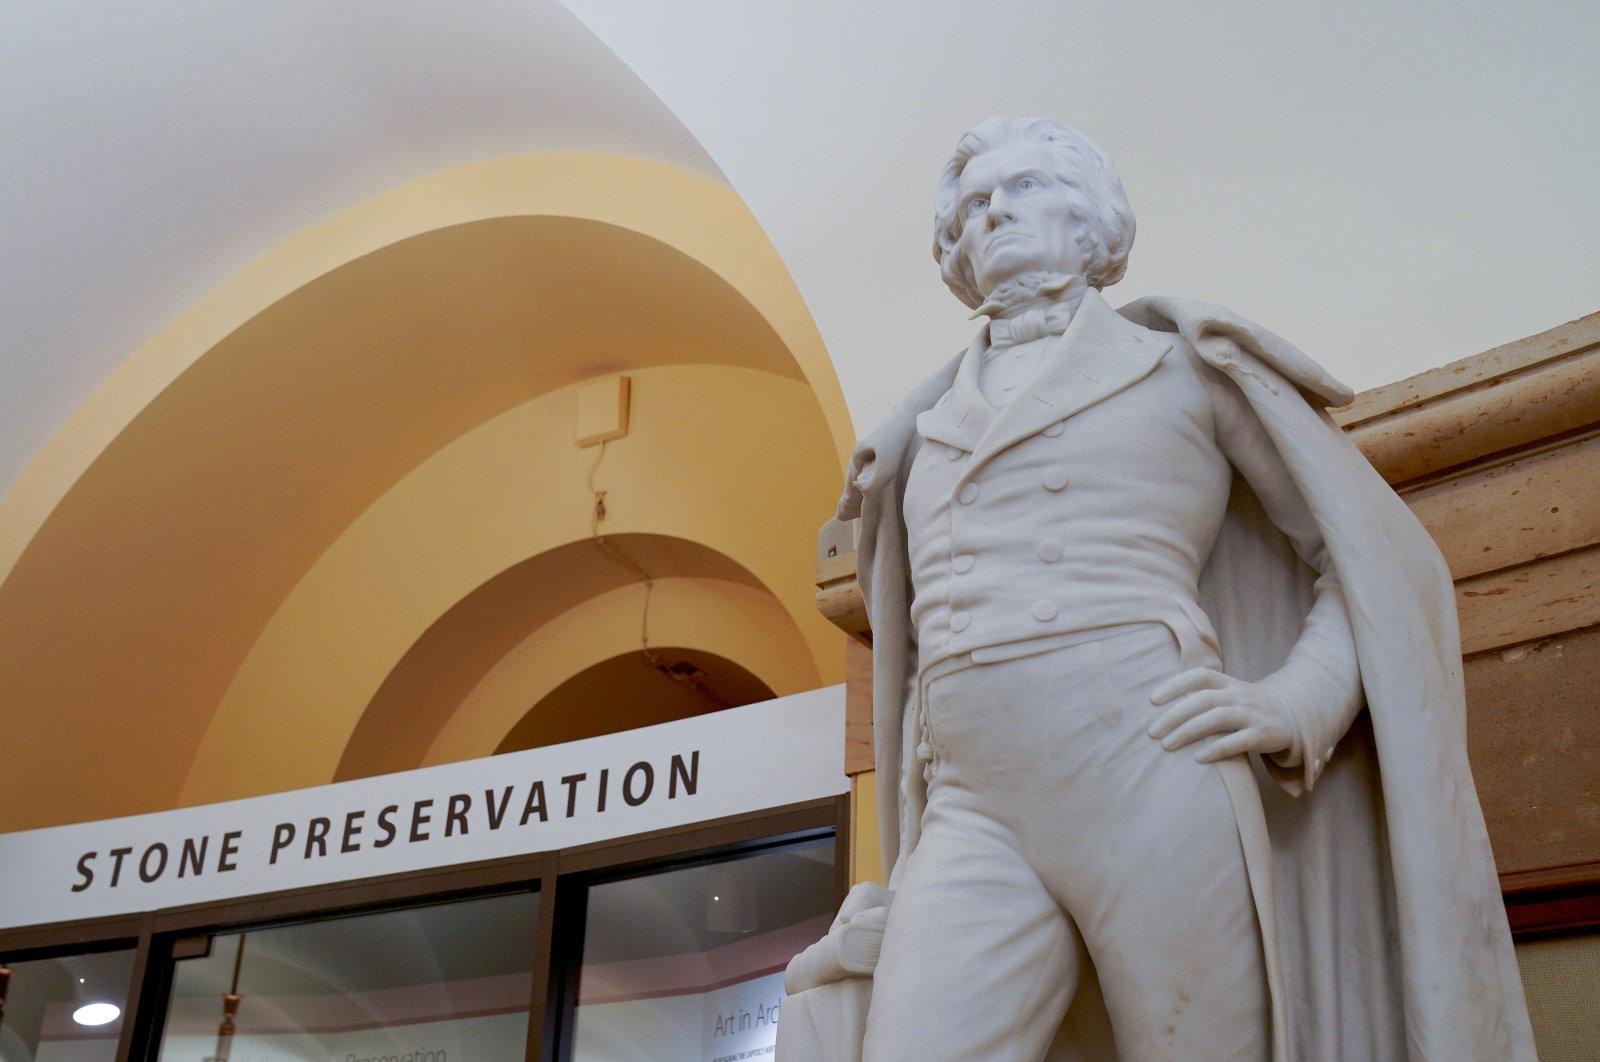 A statue of slavery advocate John C. Calhoun in the U.S. Capitol, Washington, U.S., July 23, 2020. (Reuters Photo)